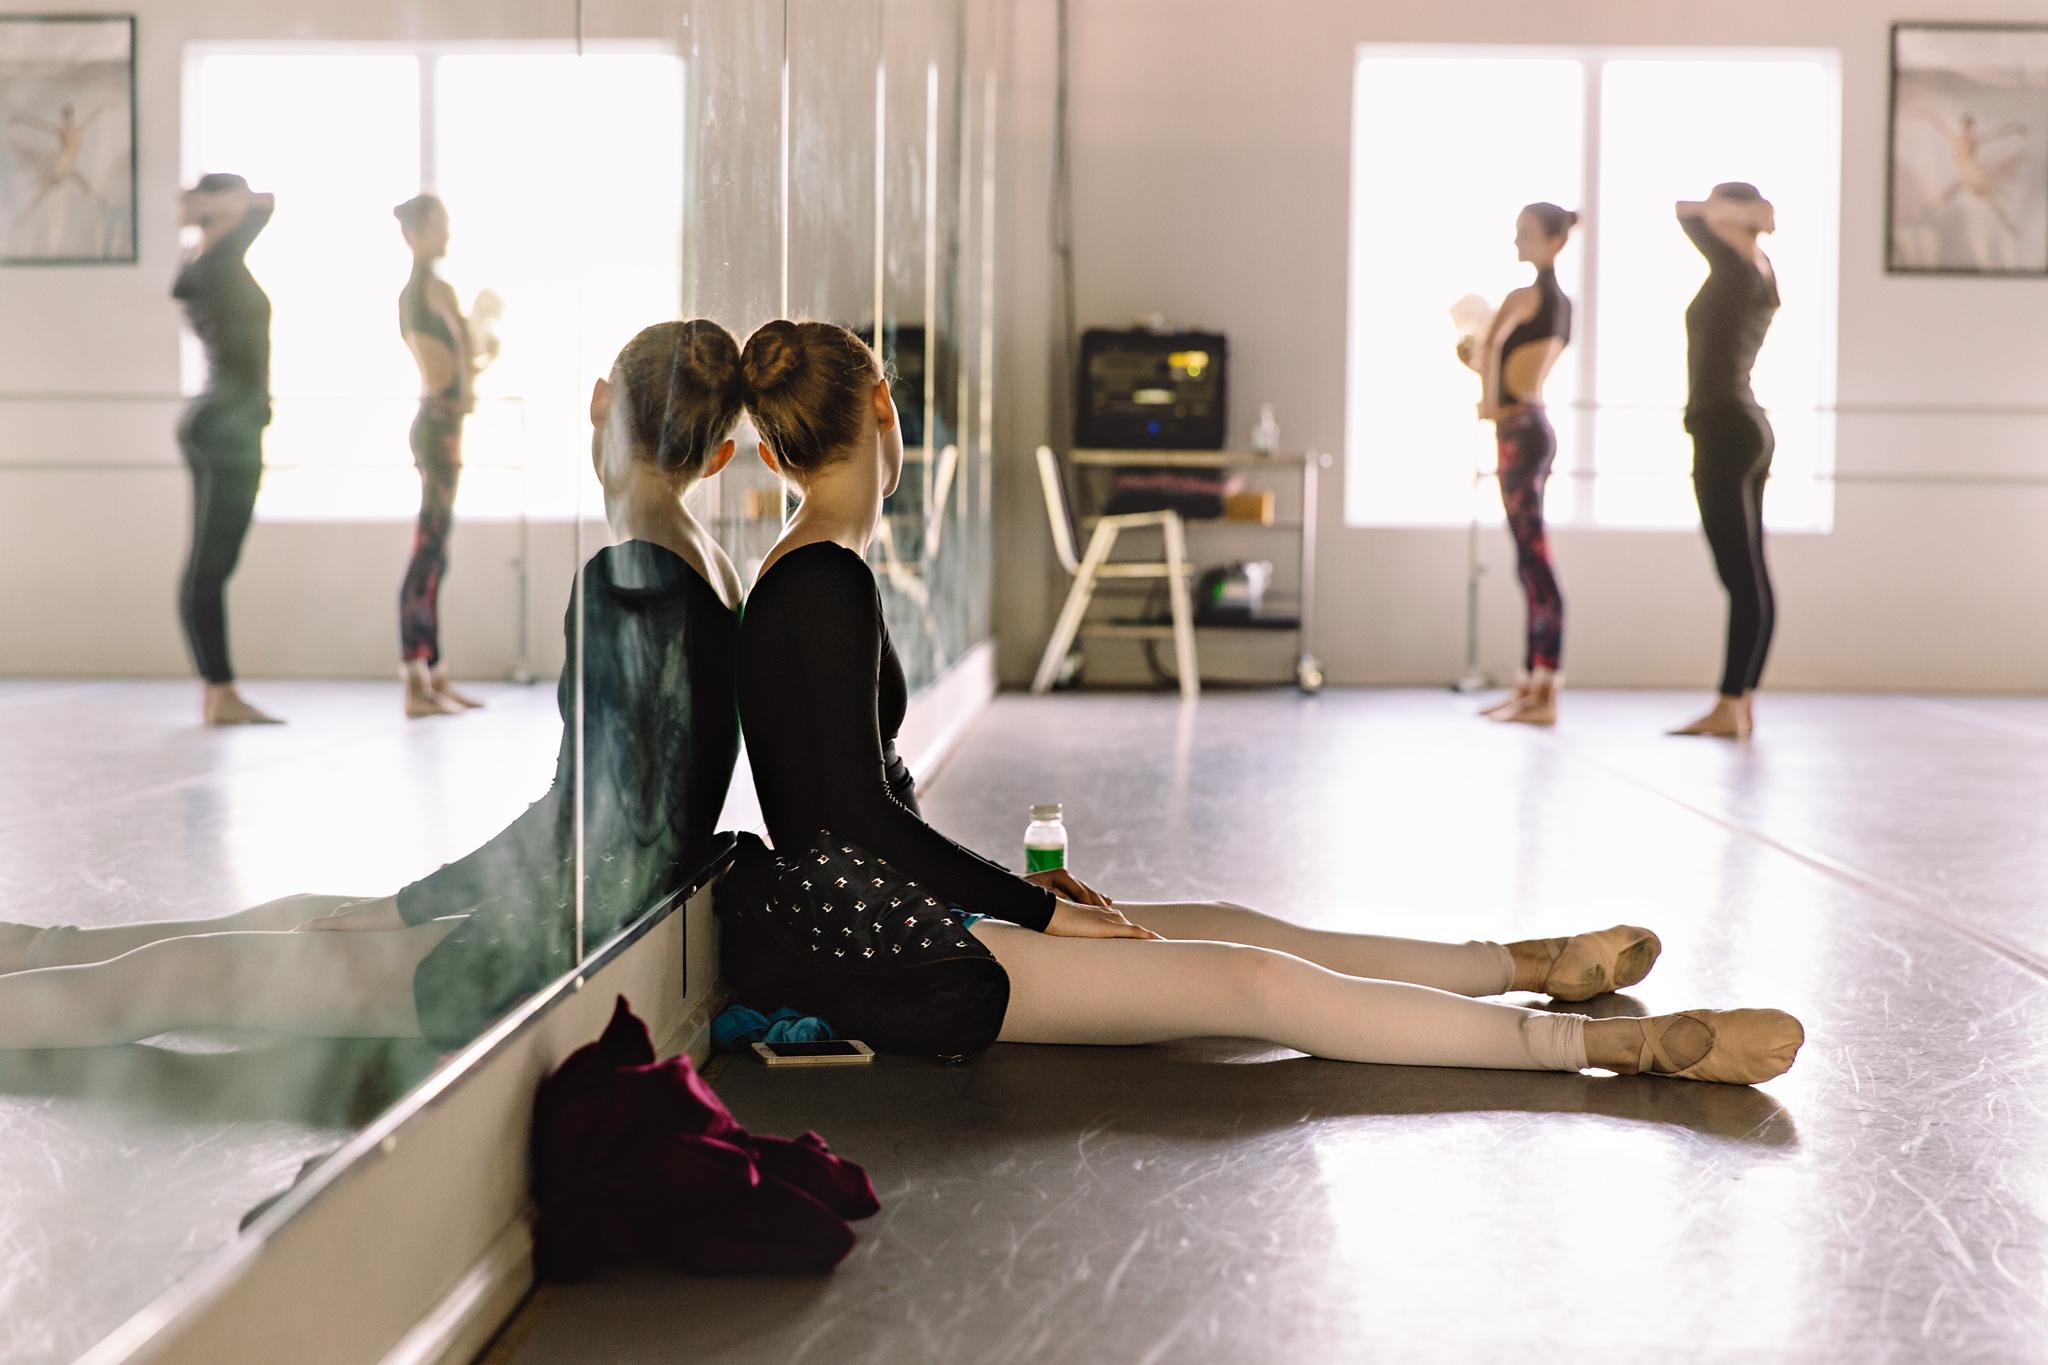 Ballerinas rehearse